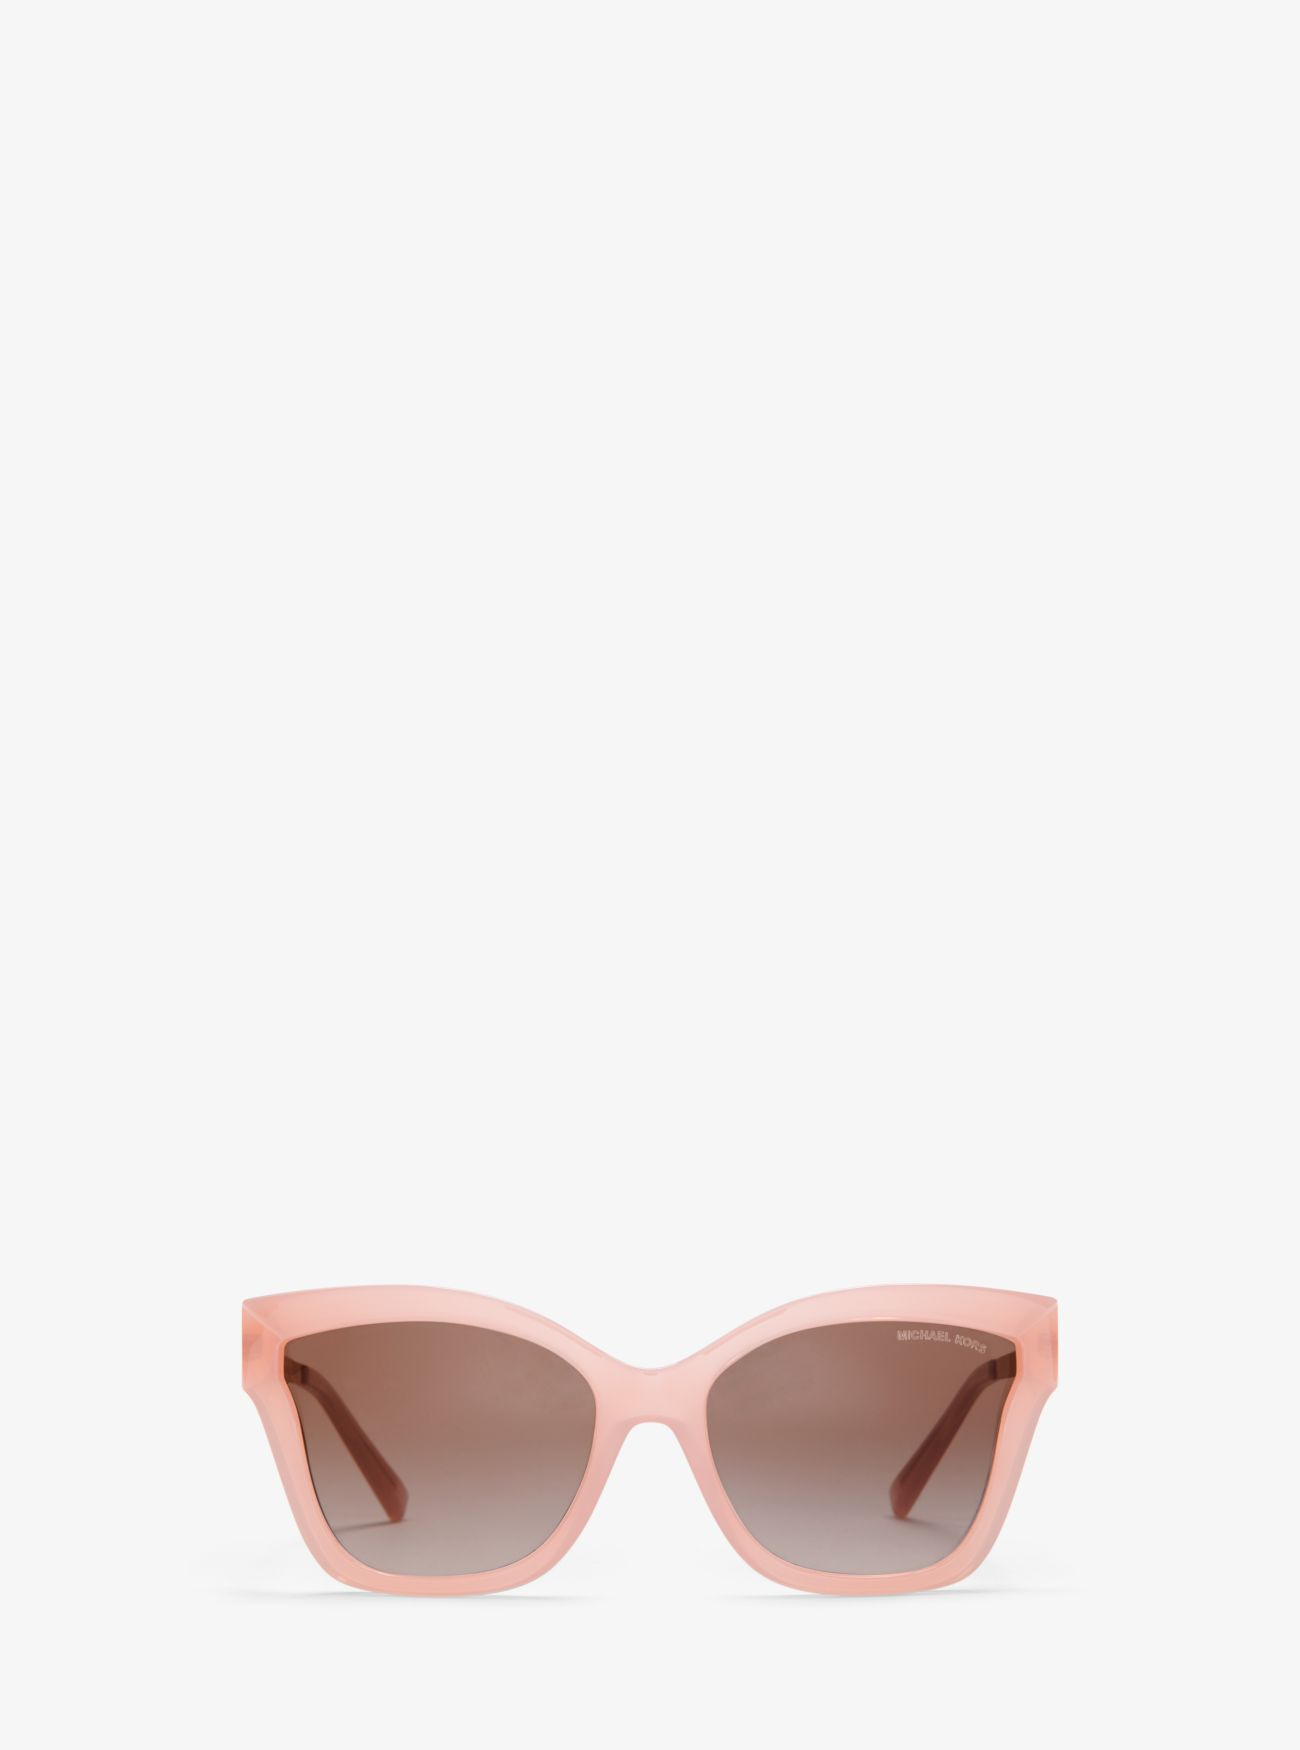 dd45ab943d7d Michael Kors Barbados Sunglasses